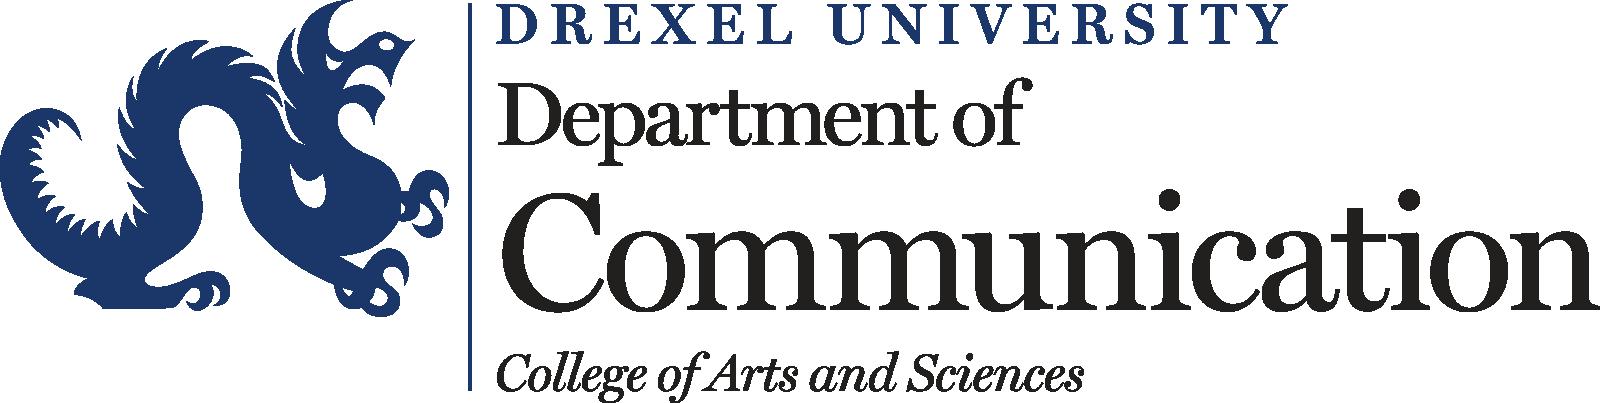 Drexel University Department of Communication